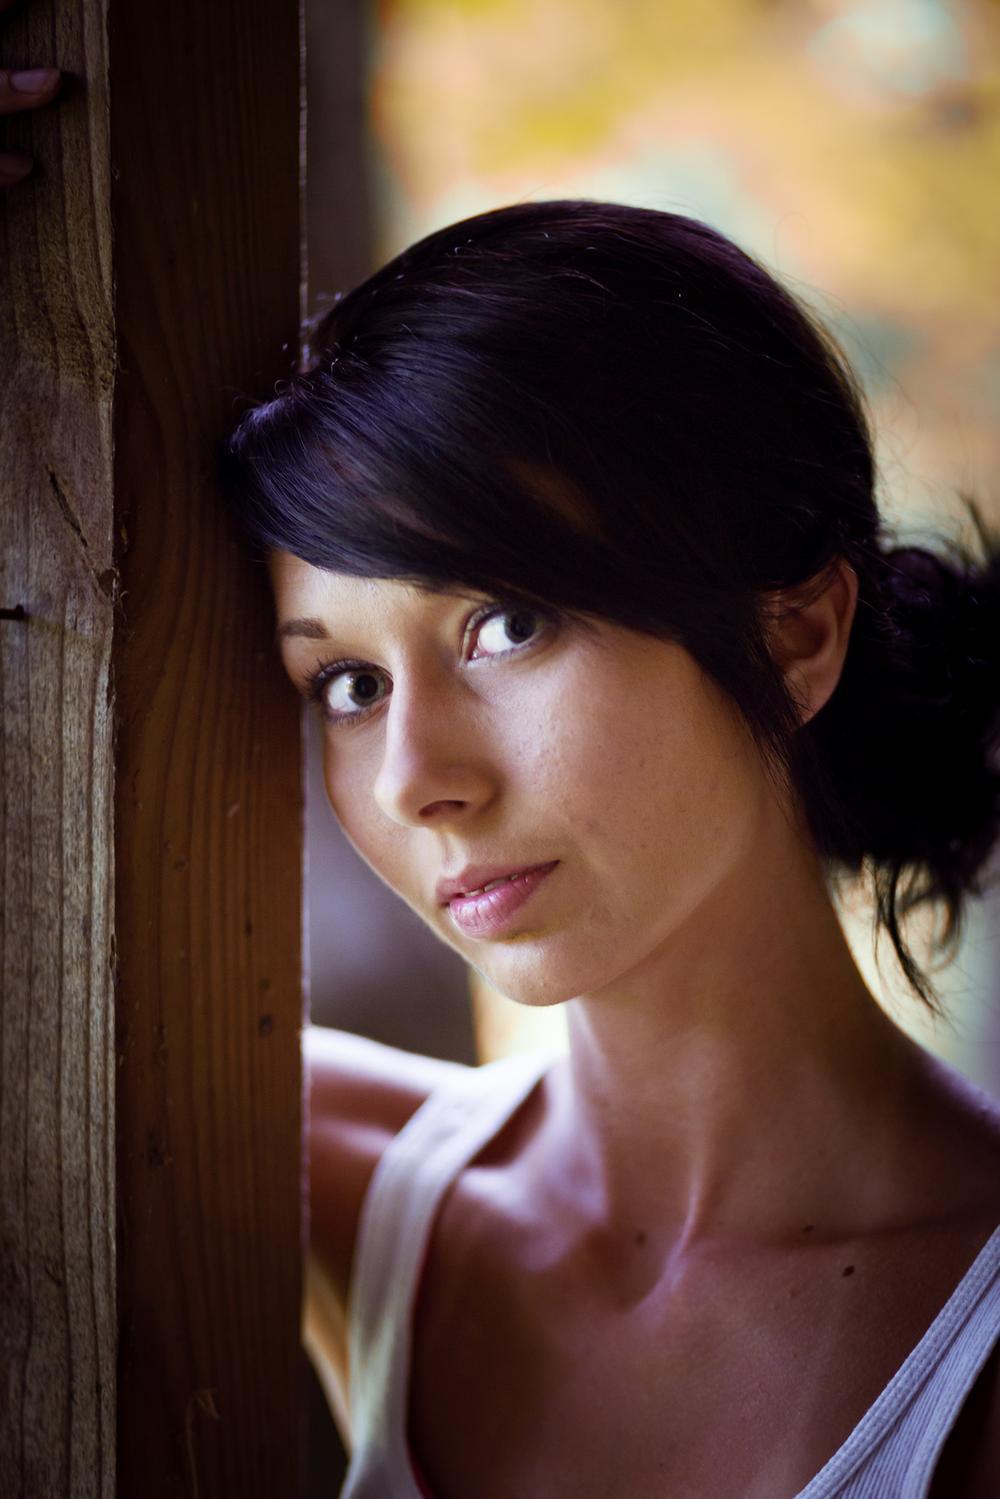 #photography #portraiture #autumn #canon #tennessee via Michael Sturgeon